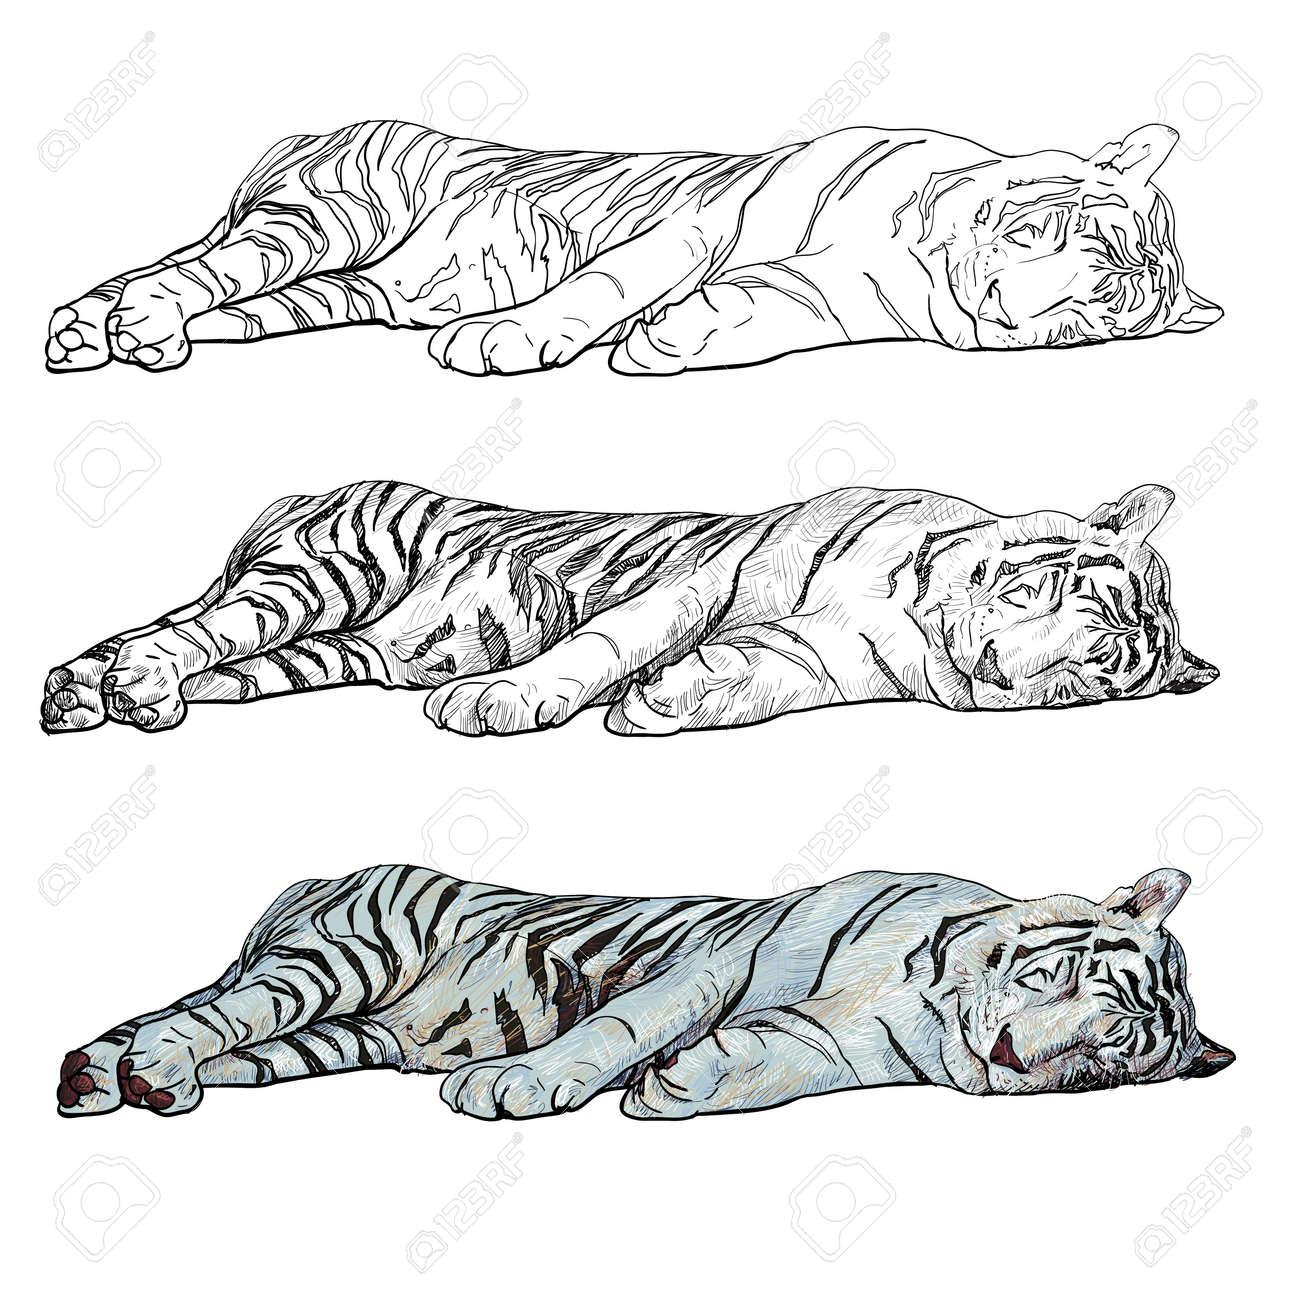 sleeping white tiger Stock Vector - 19869675